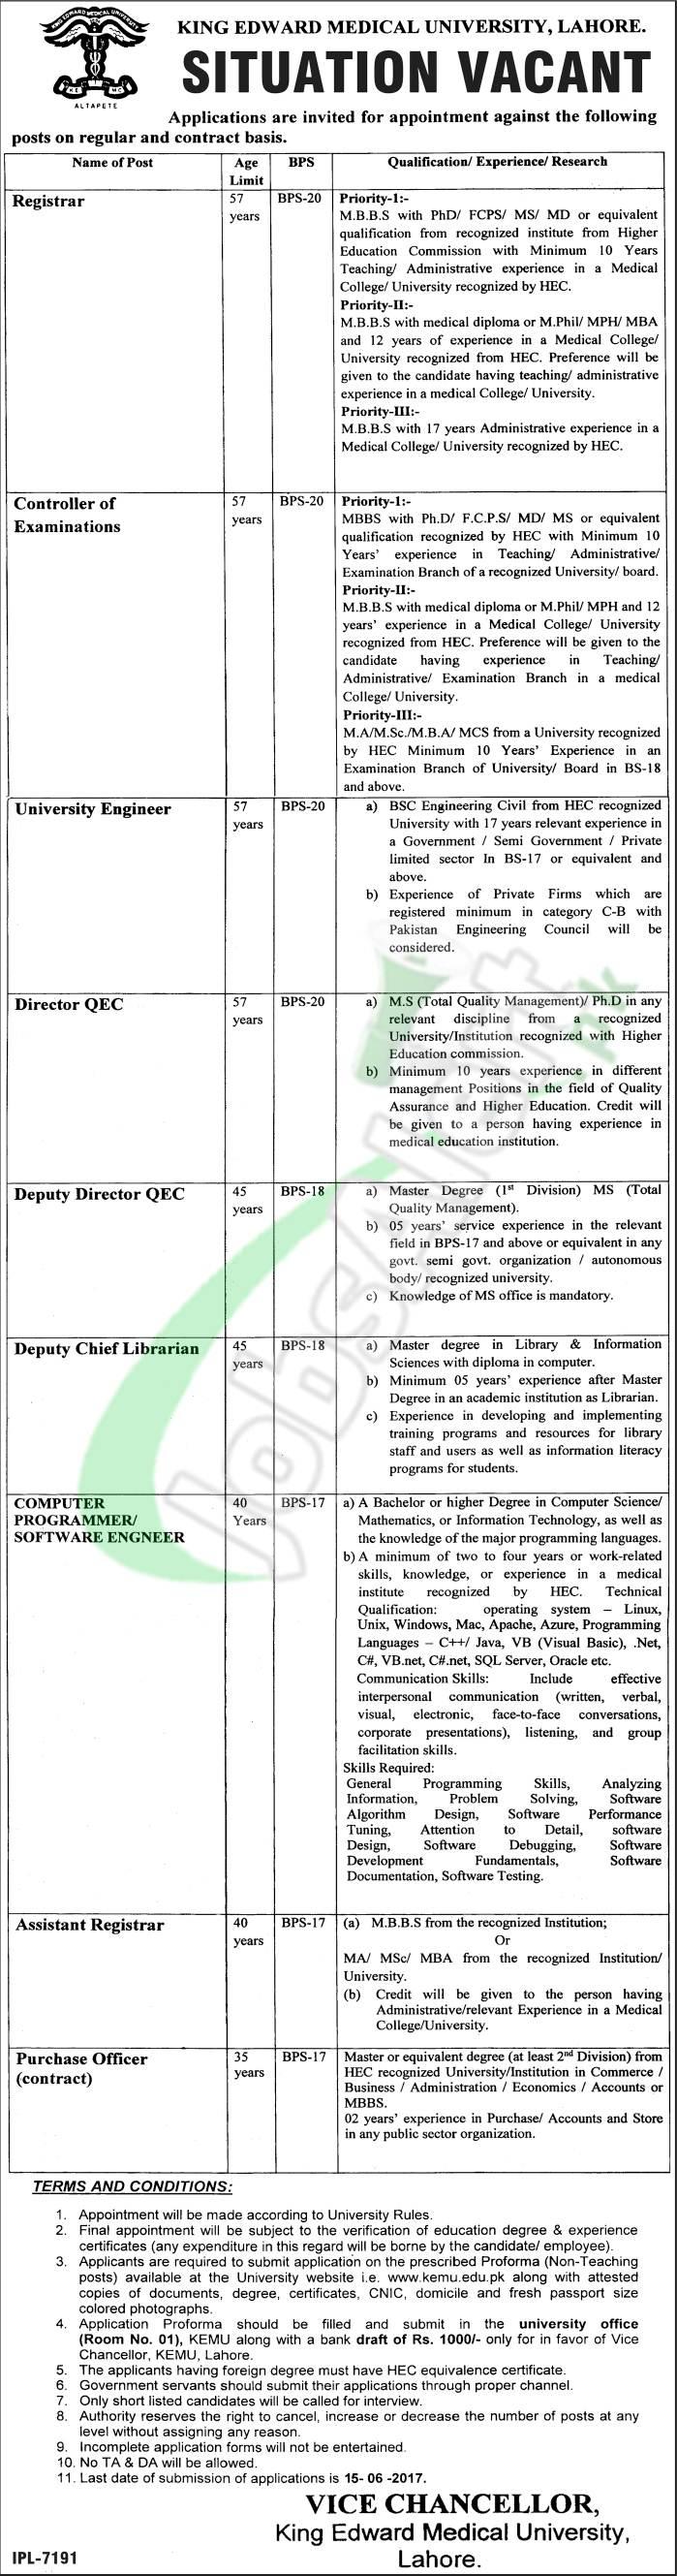 www kemu edu pk application form 2017